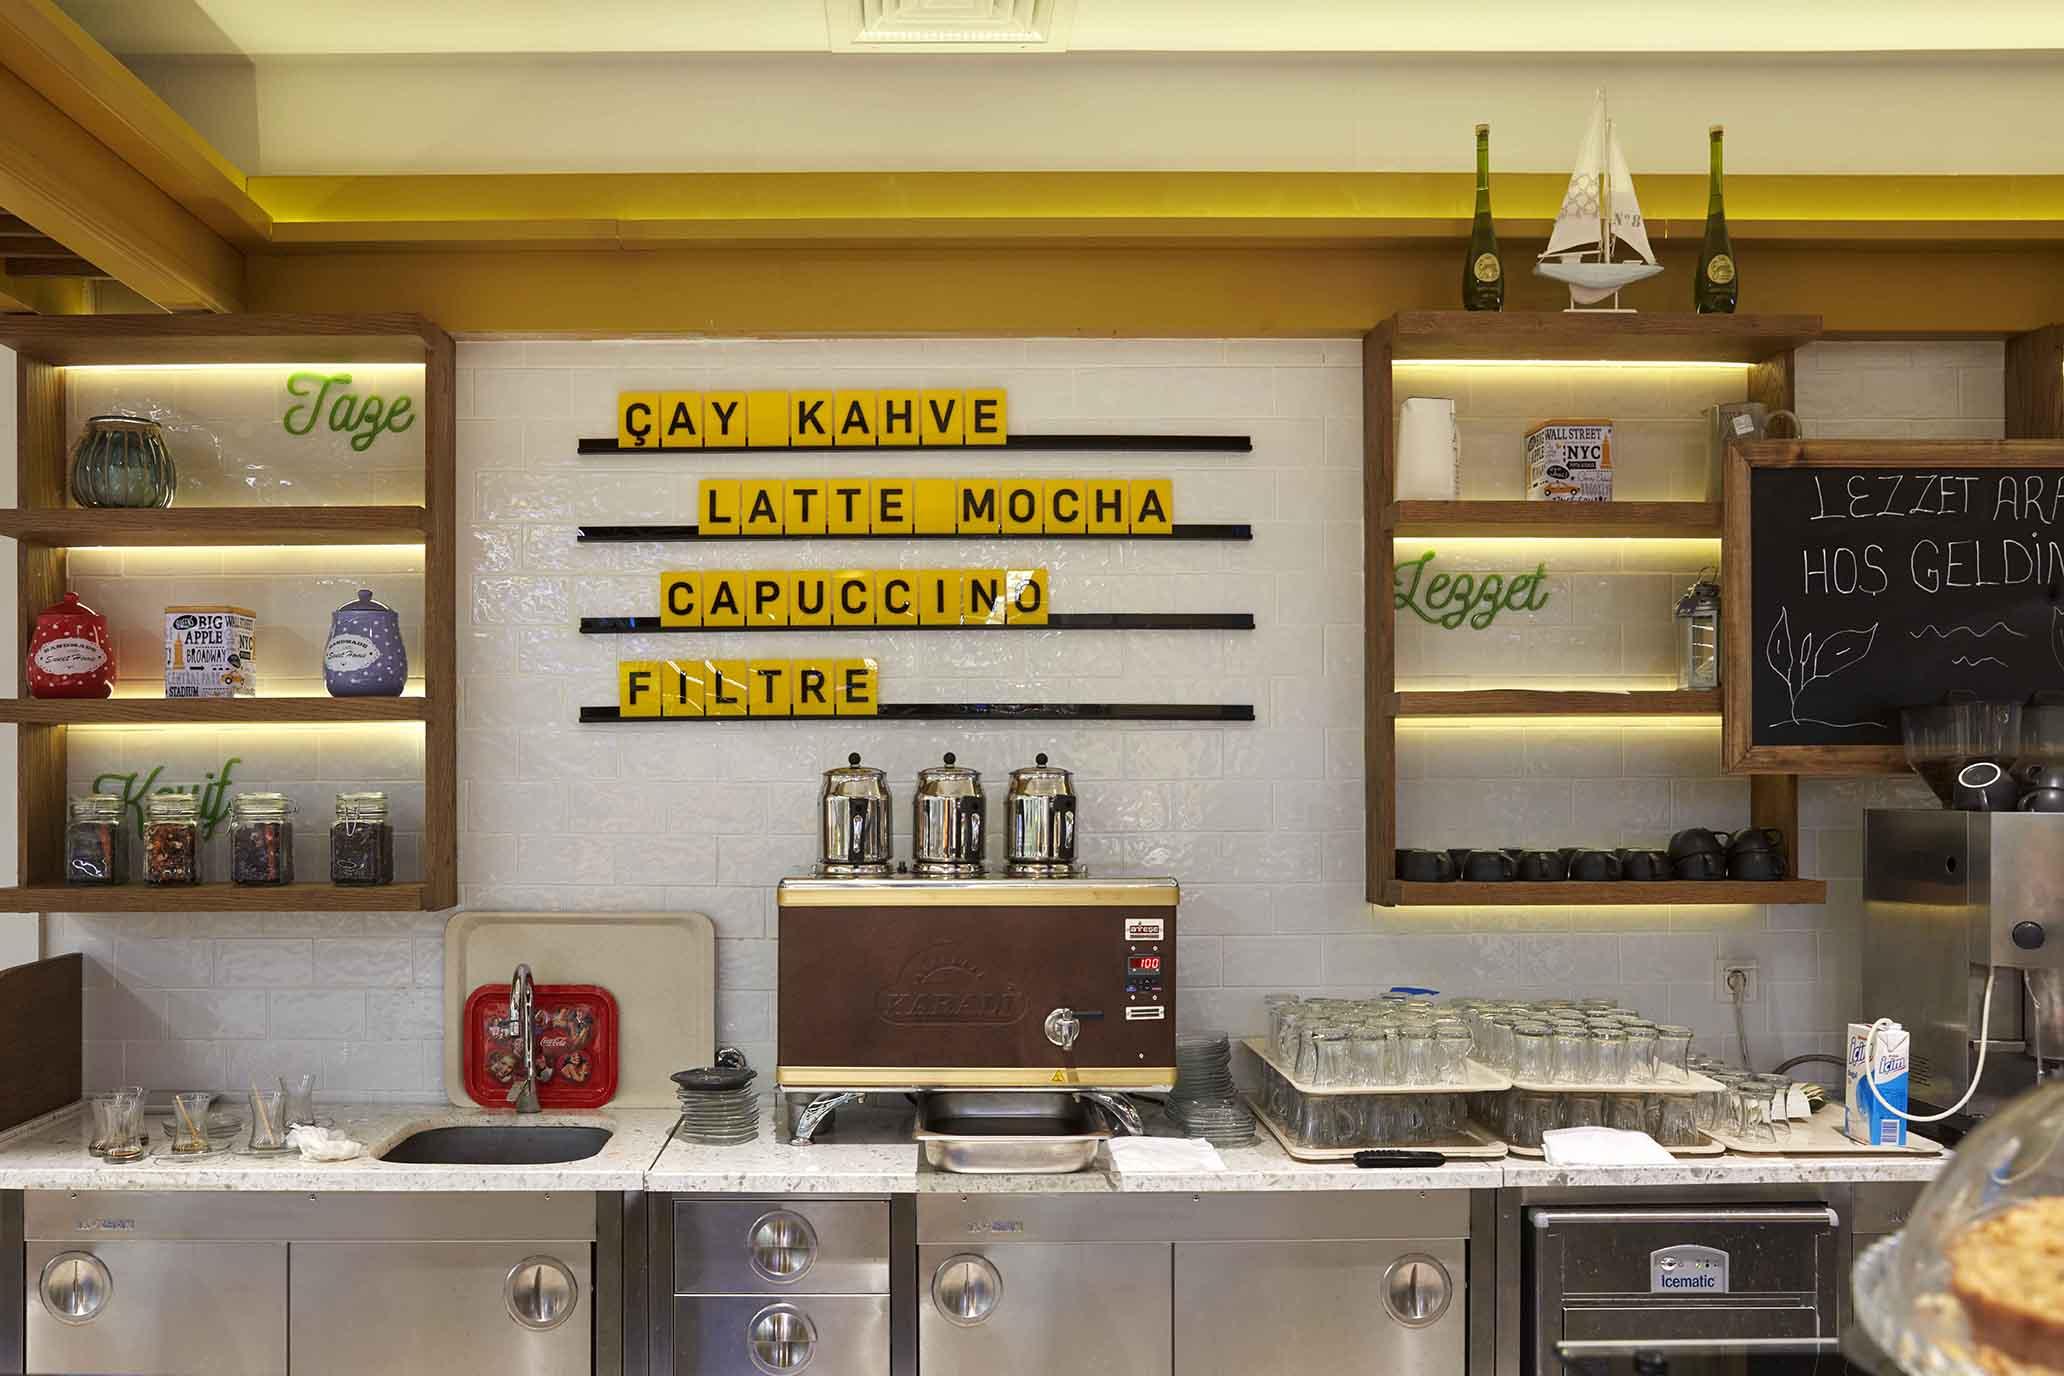 lezzet-arasi-nautilus-cafe-tasarimi